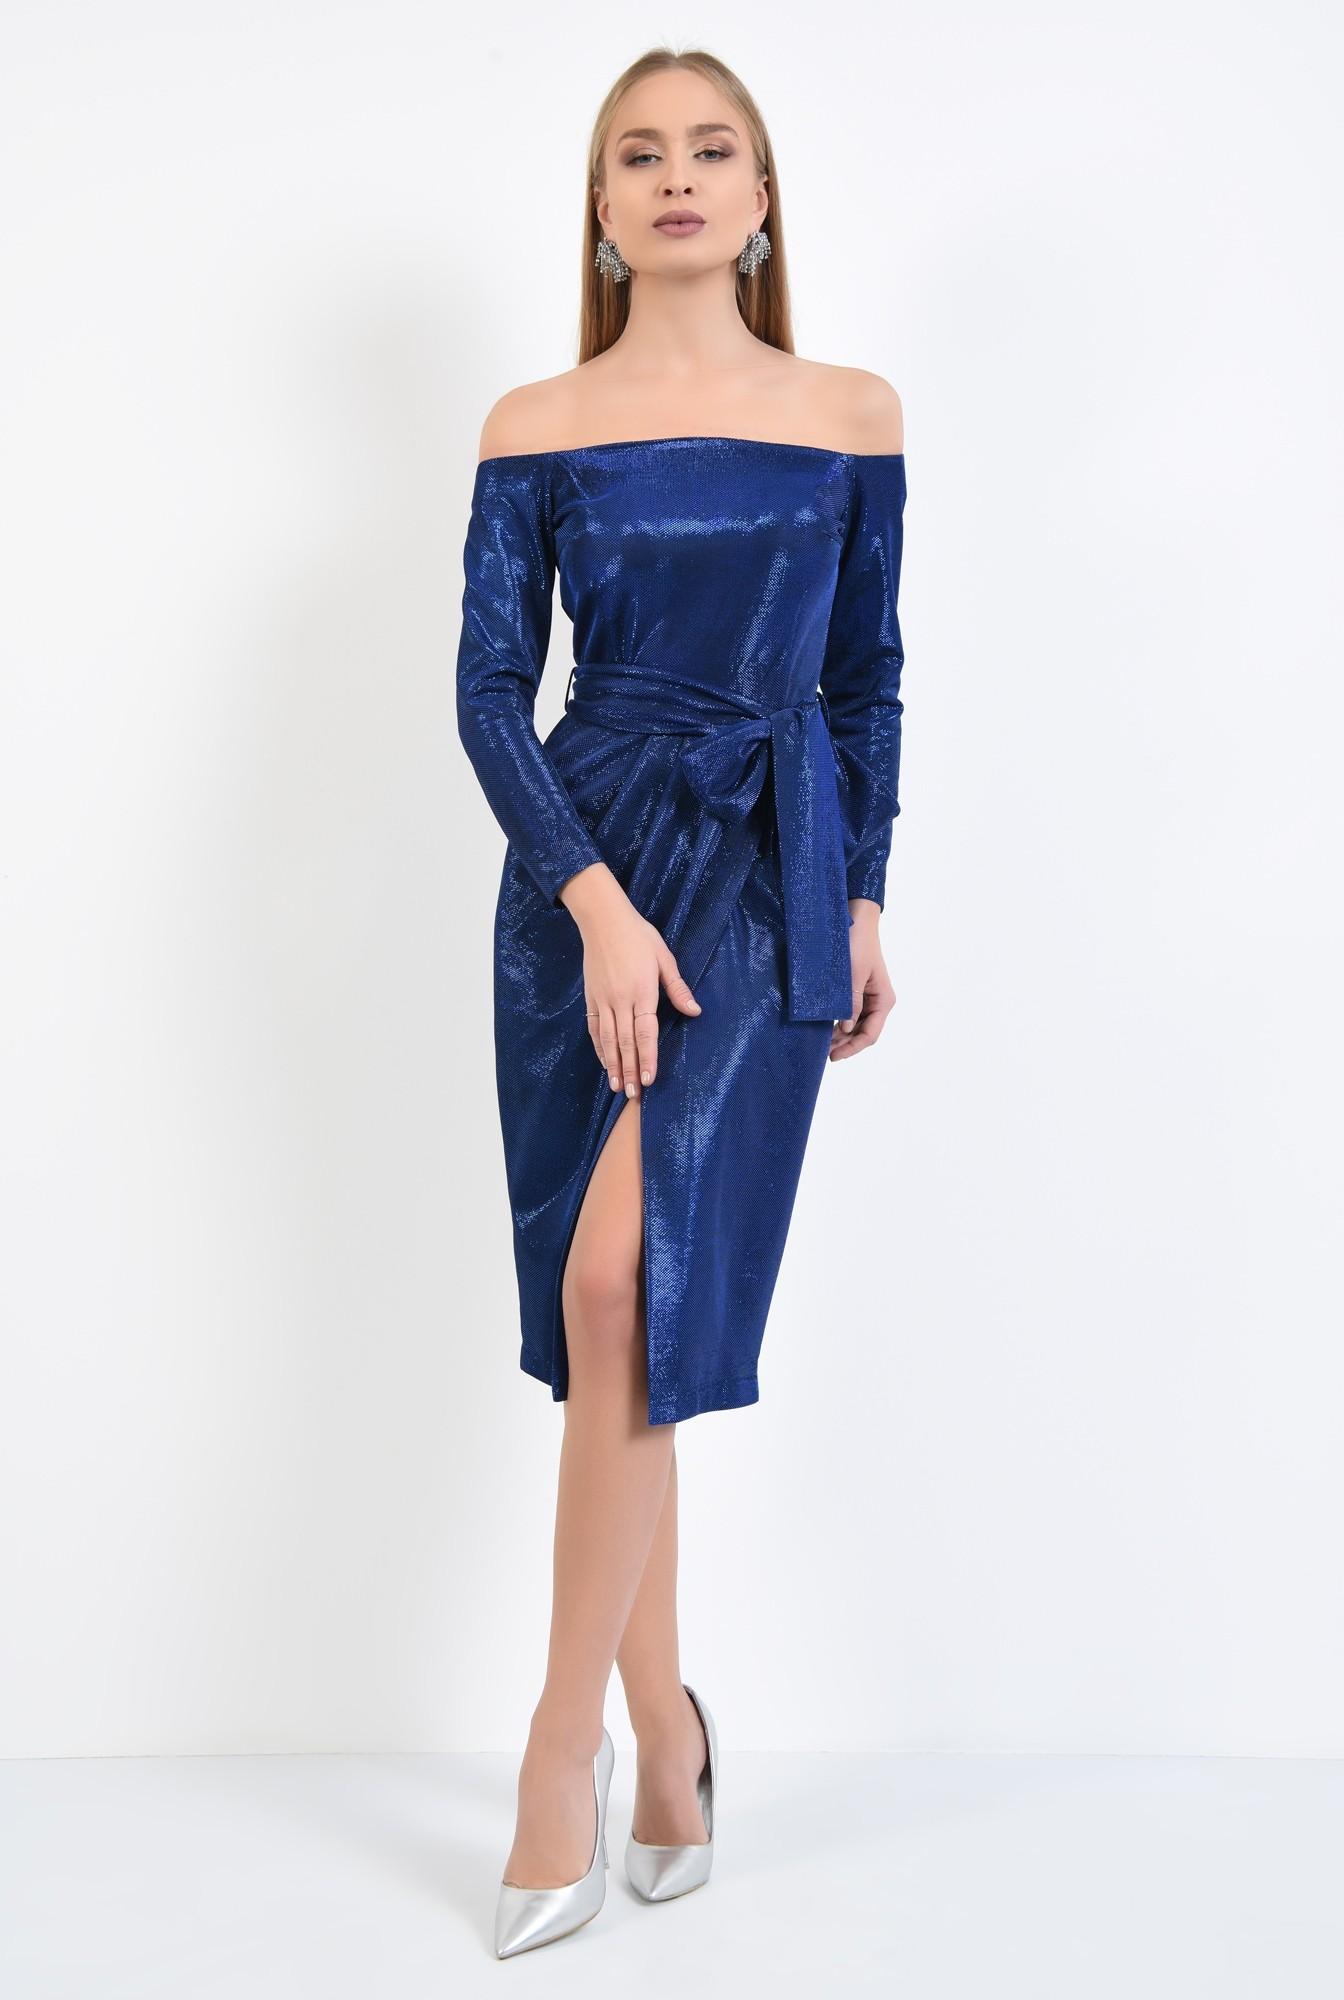 3 - rochie eleganta, midi, conica, cu cordon, rochii online